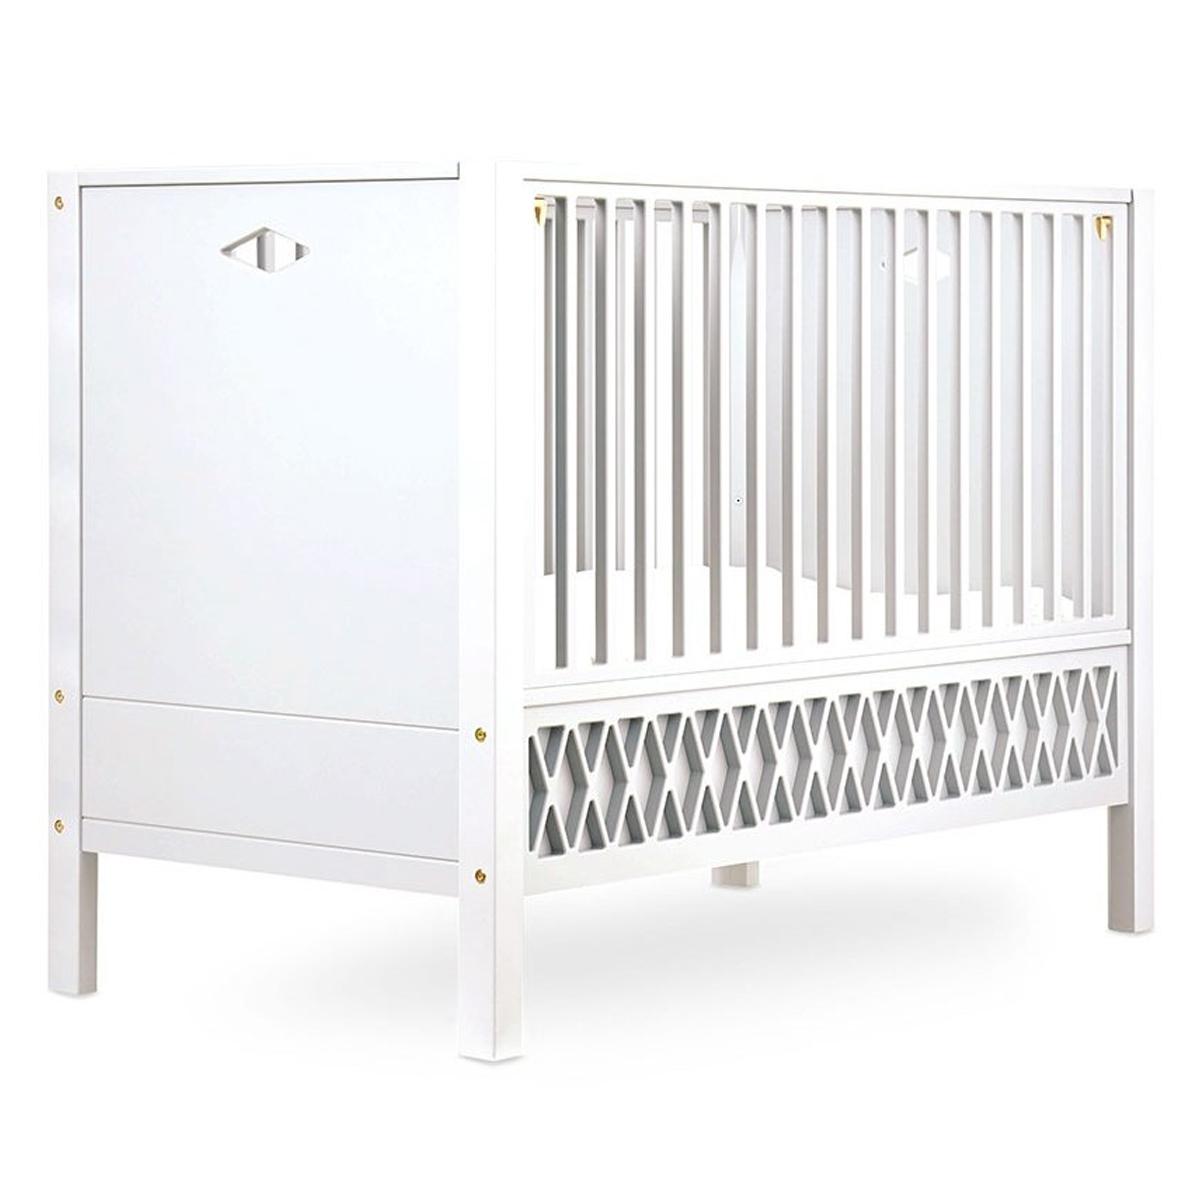 Lit bébé Lit Bébé Evolutif Harlequin Blanc - 60 x 120 cm Lit Bébé Evolutif Harlequin Blanc - 60 x 120 cm